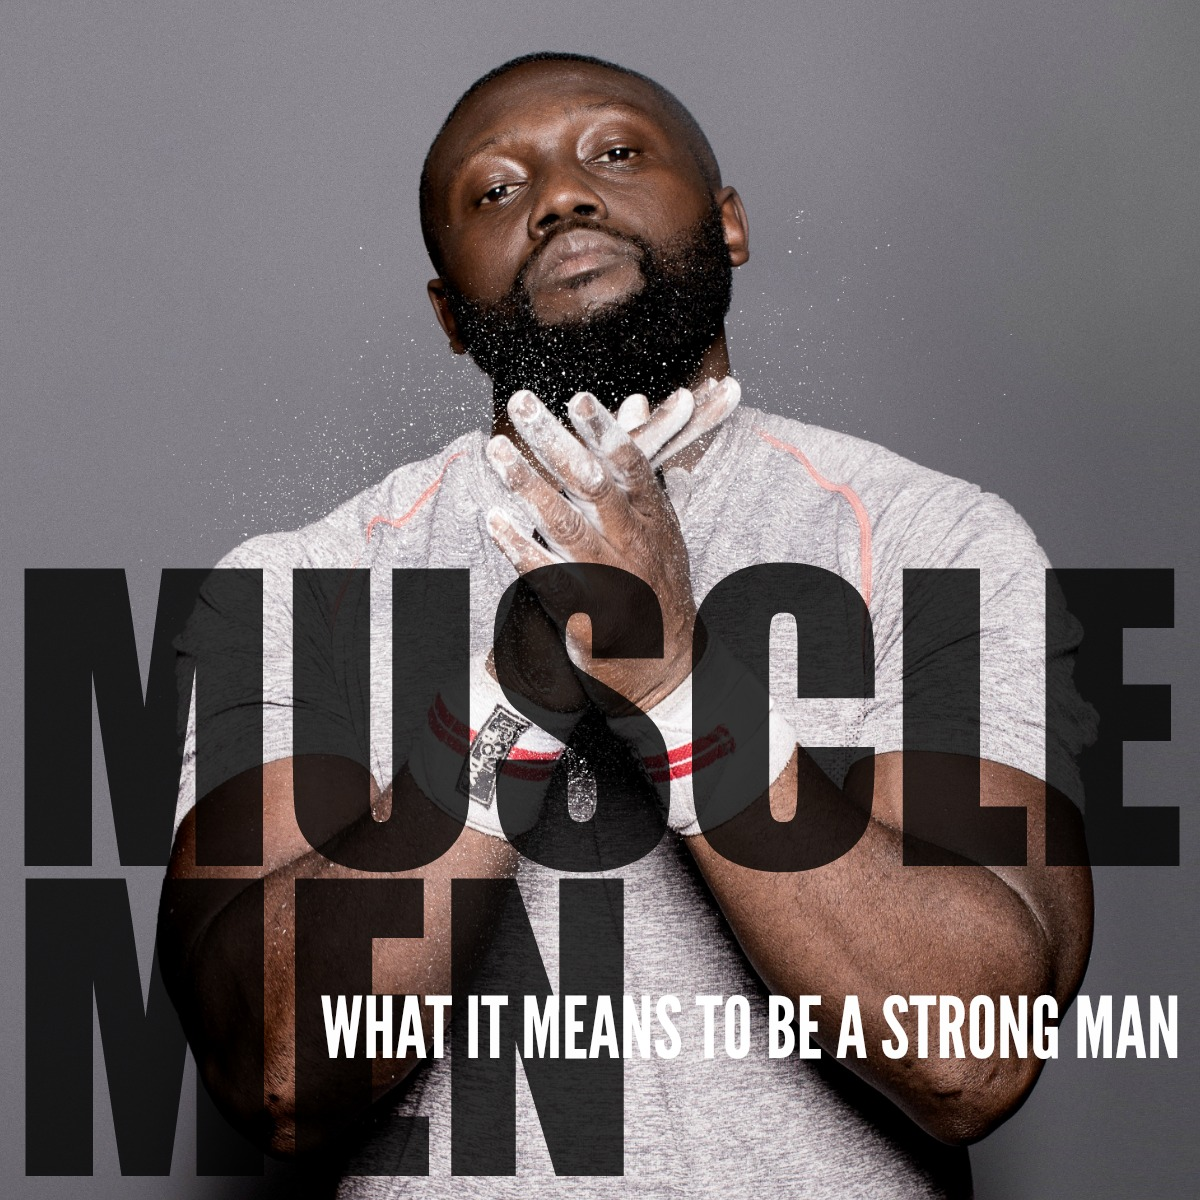 Muscle Men: Week 4